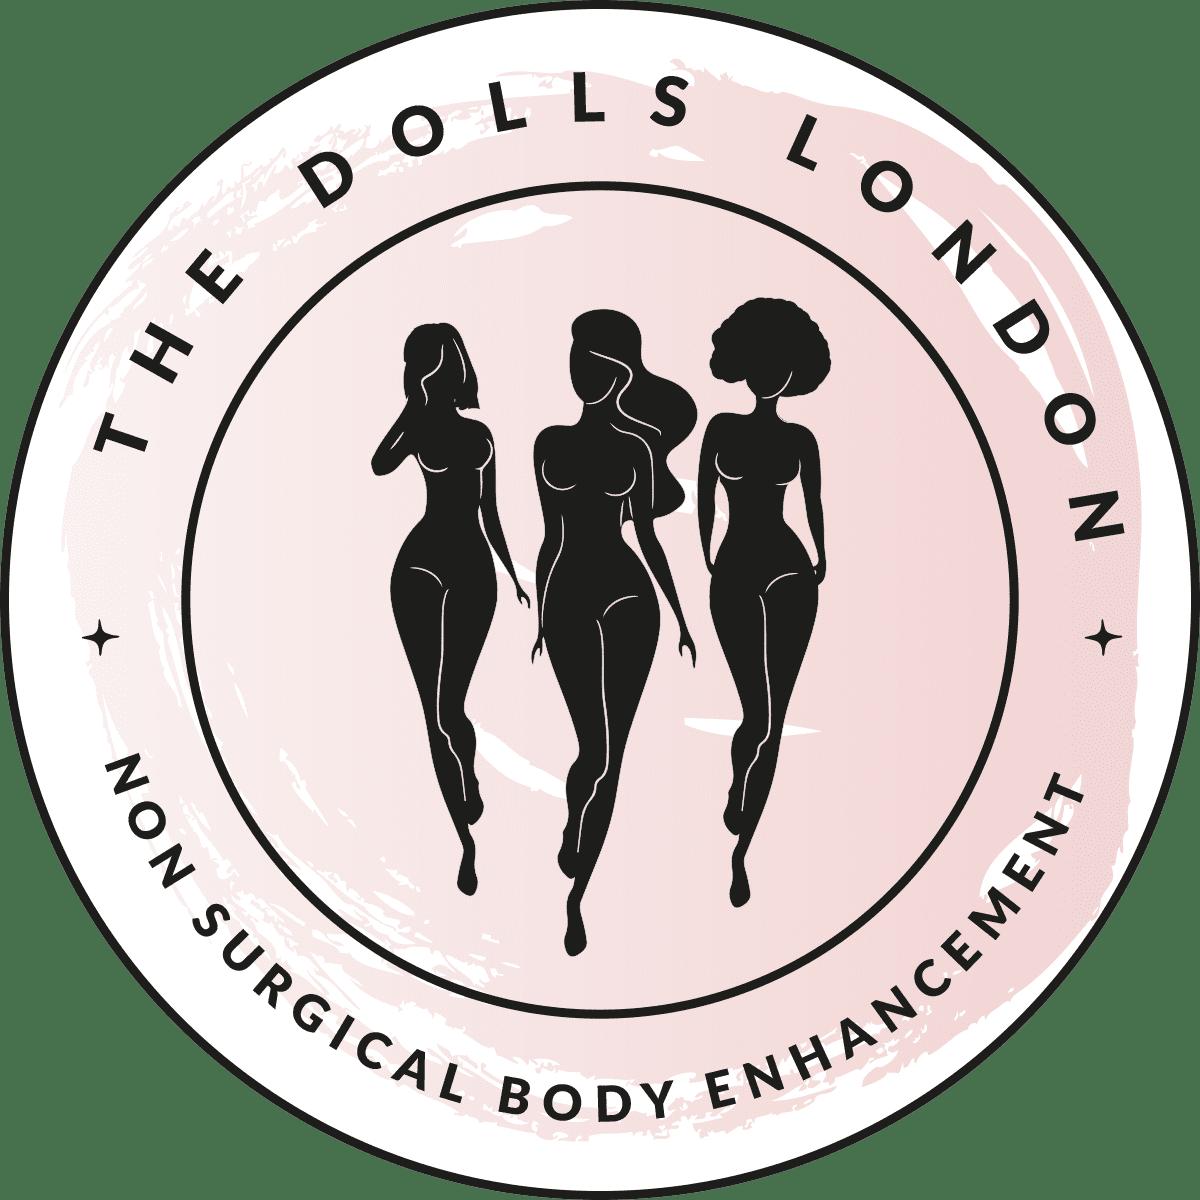 The Dolls London